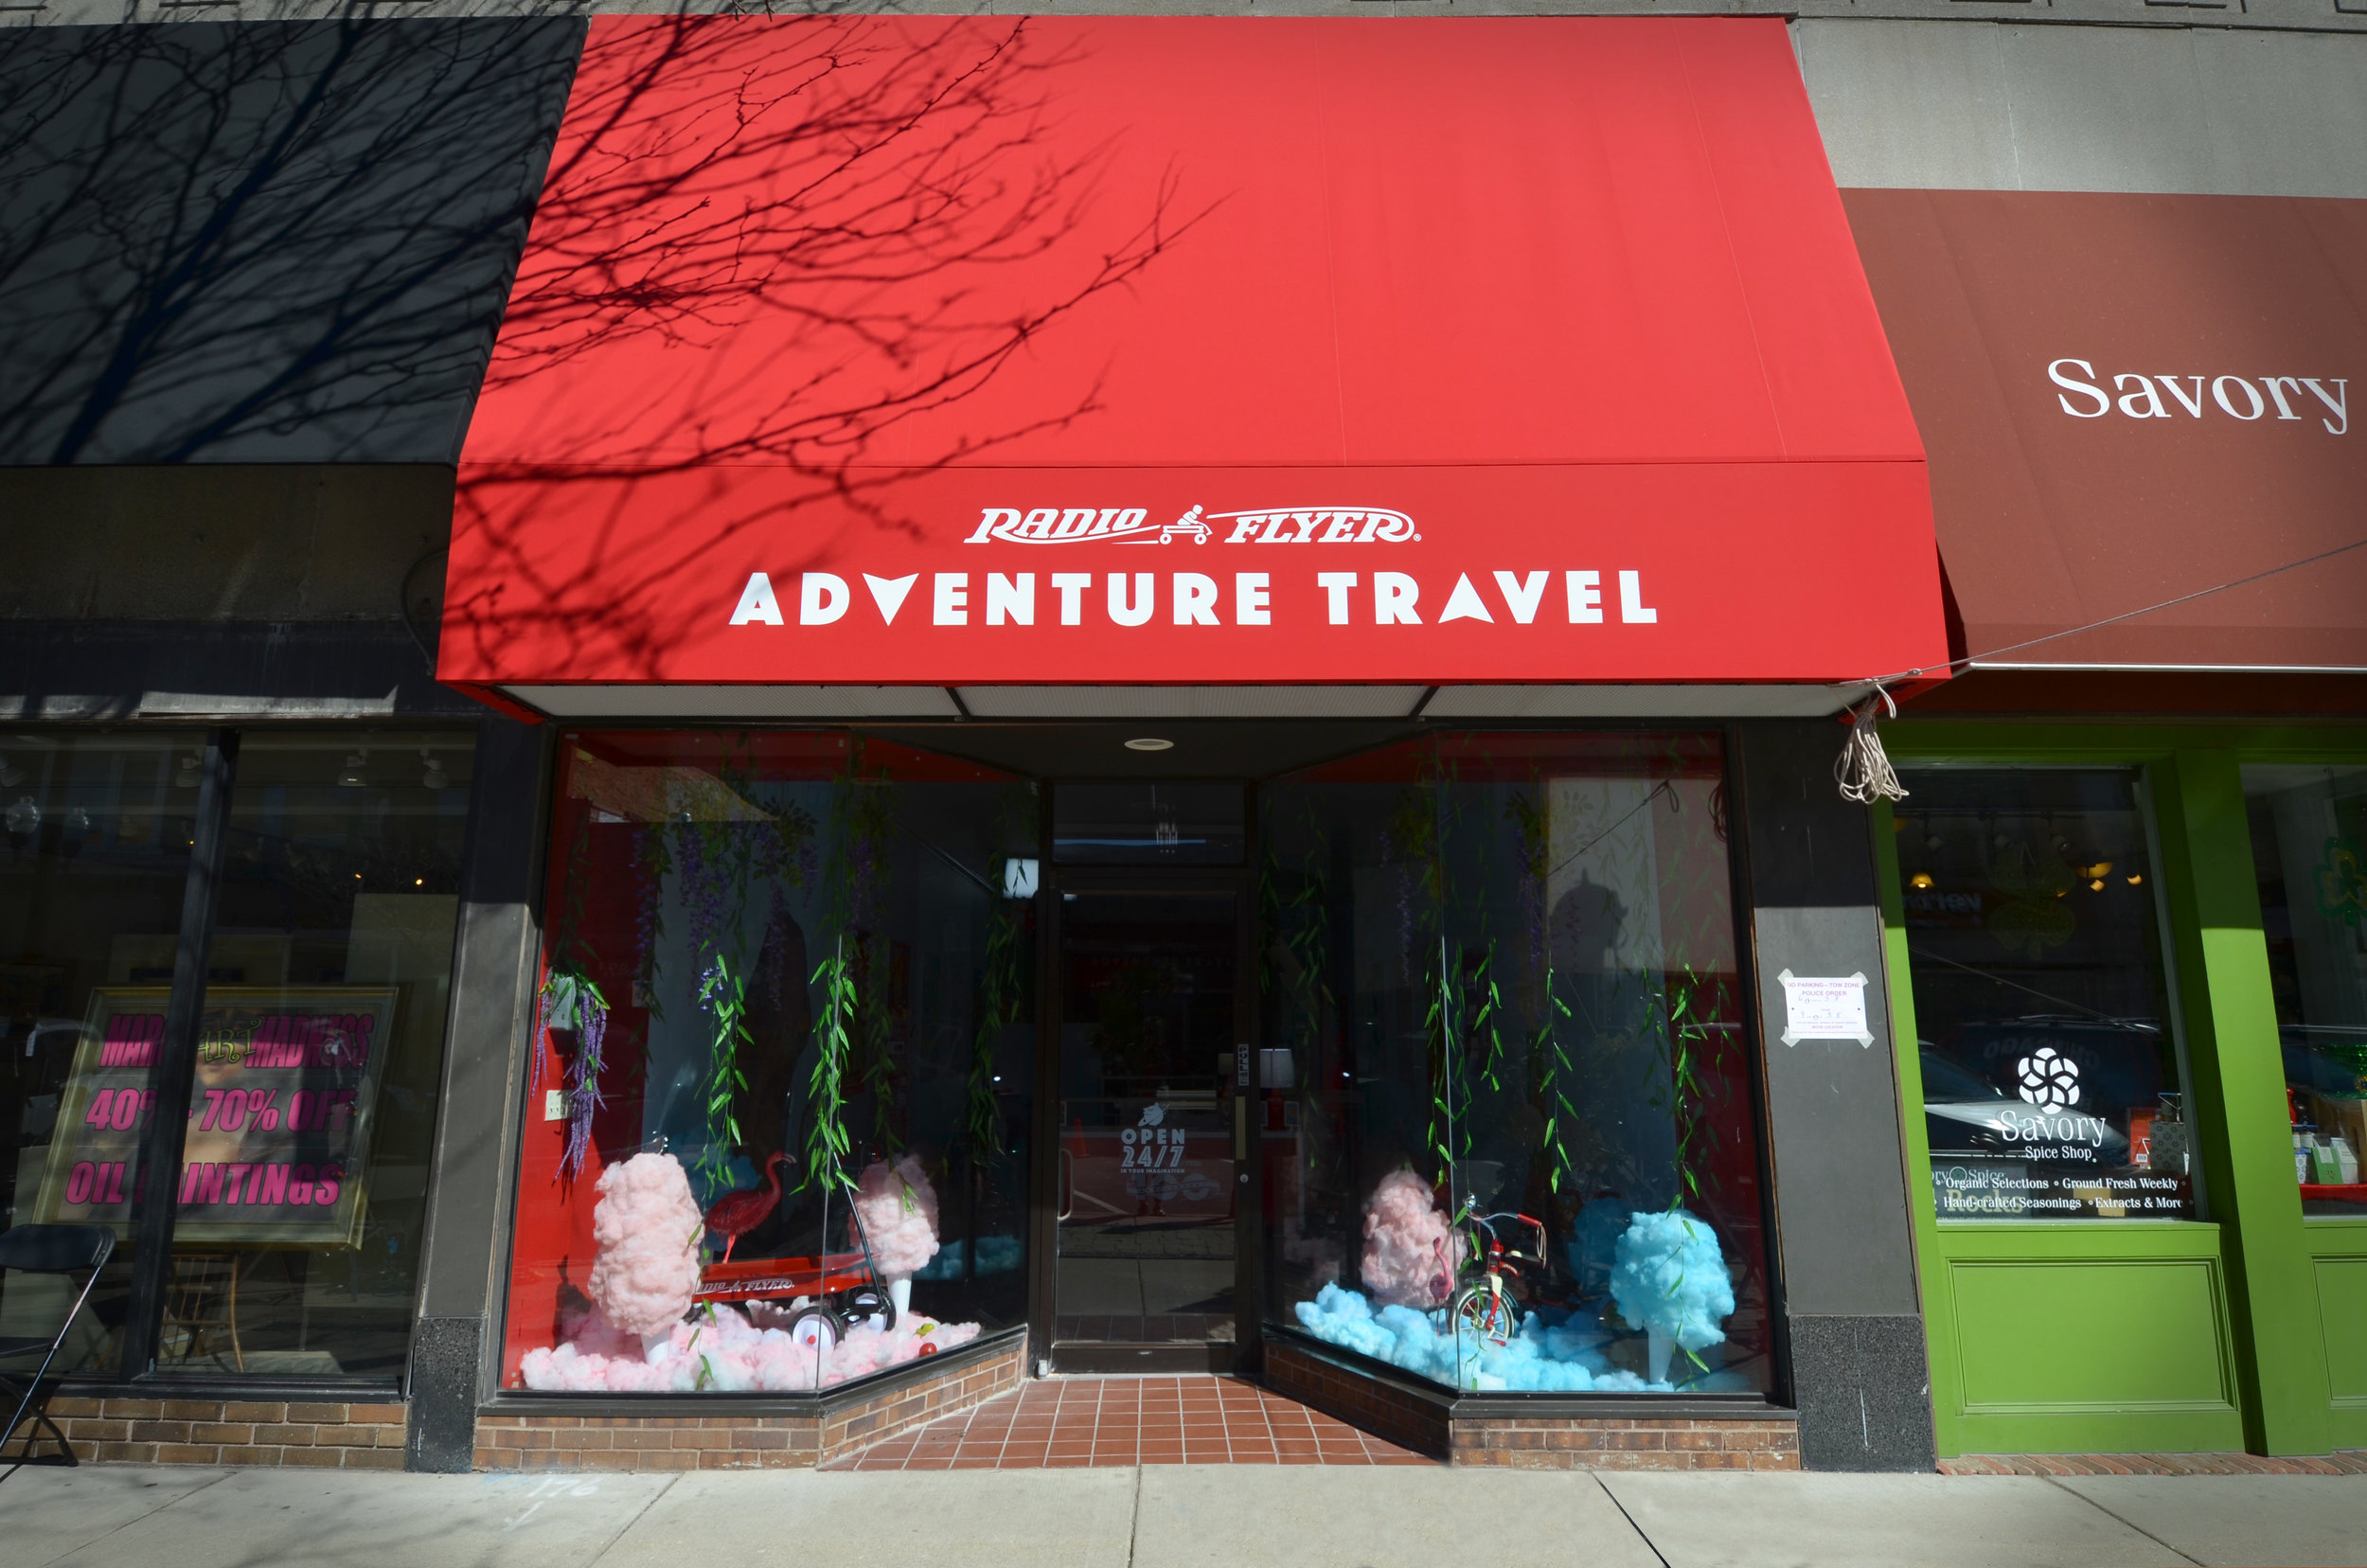 adventure travel by radio flyer